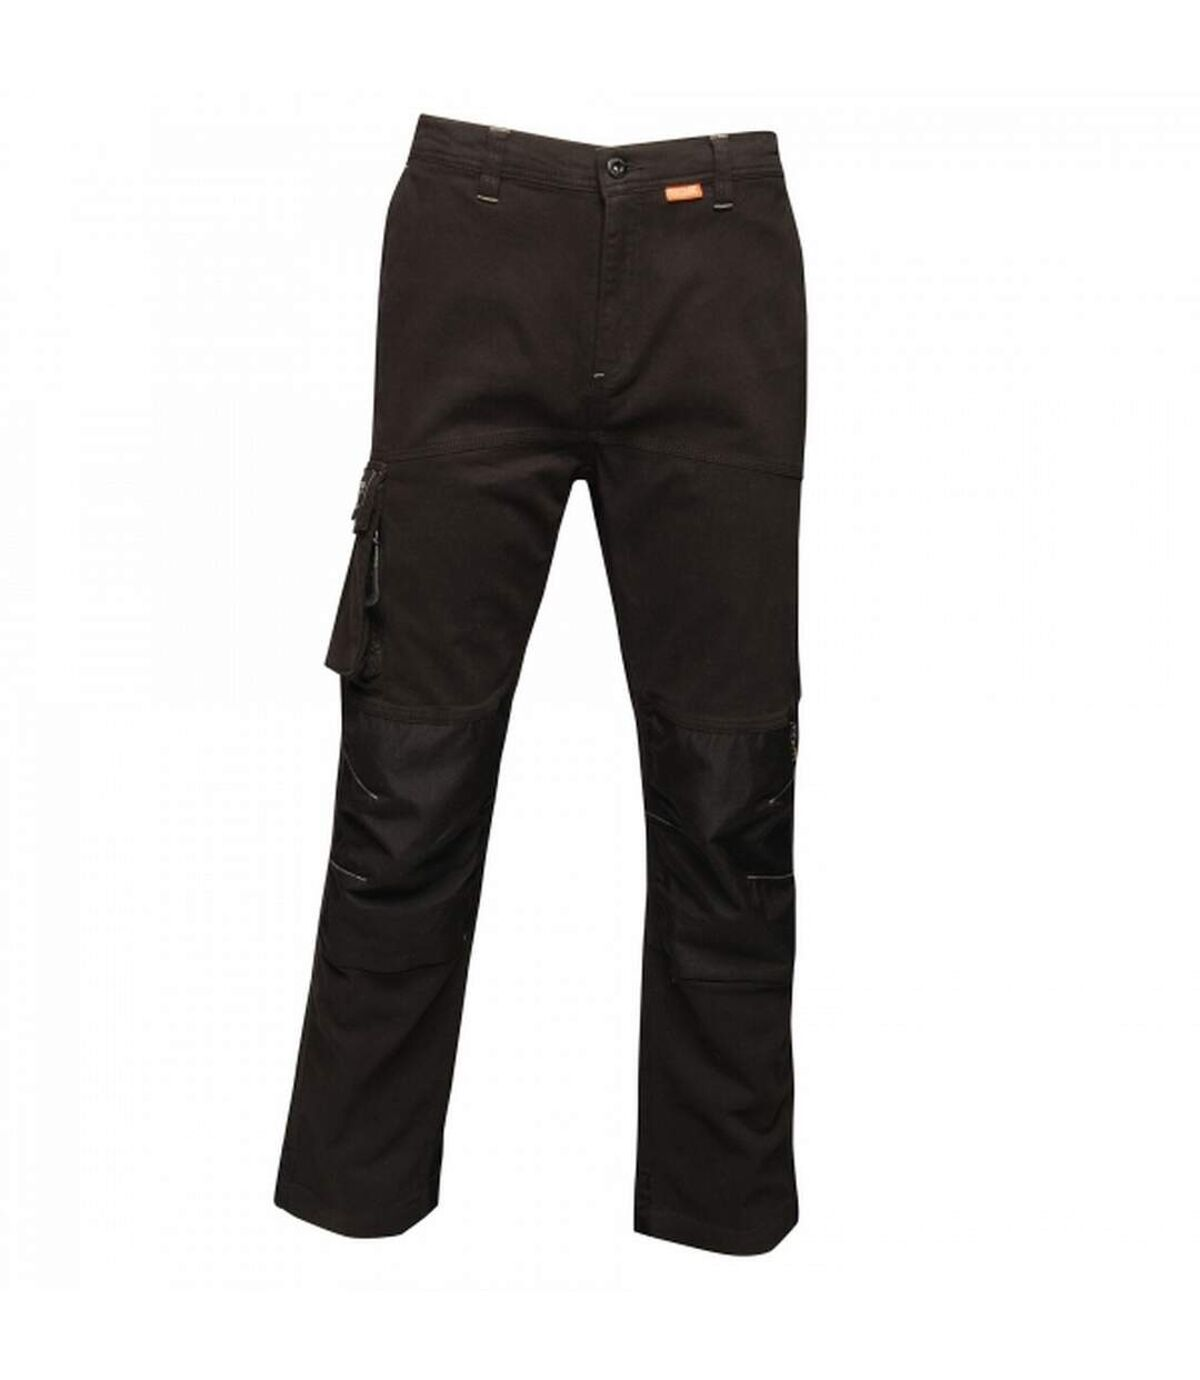 Regatta Mens Scandal Stretch Work Trousers - Regular (Traffic Black) - UTRG3749